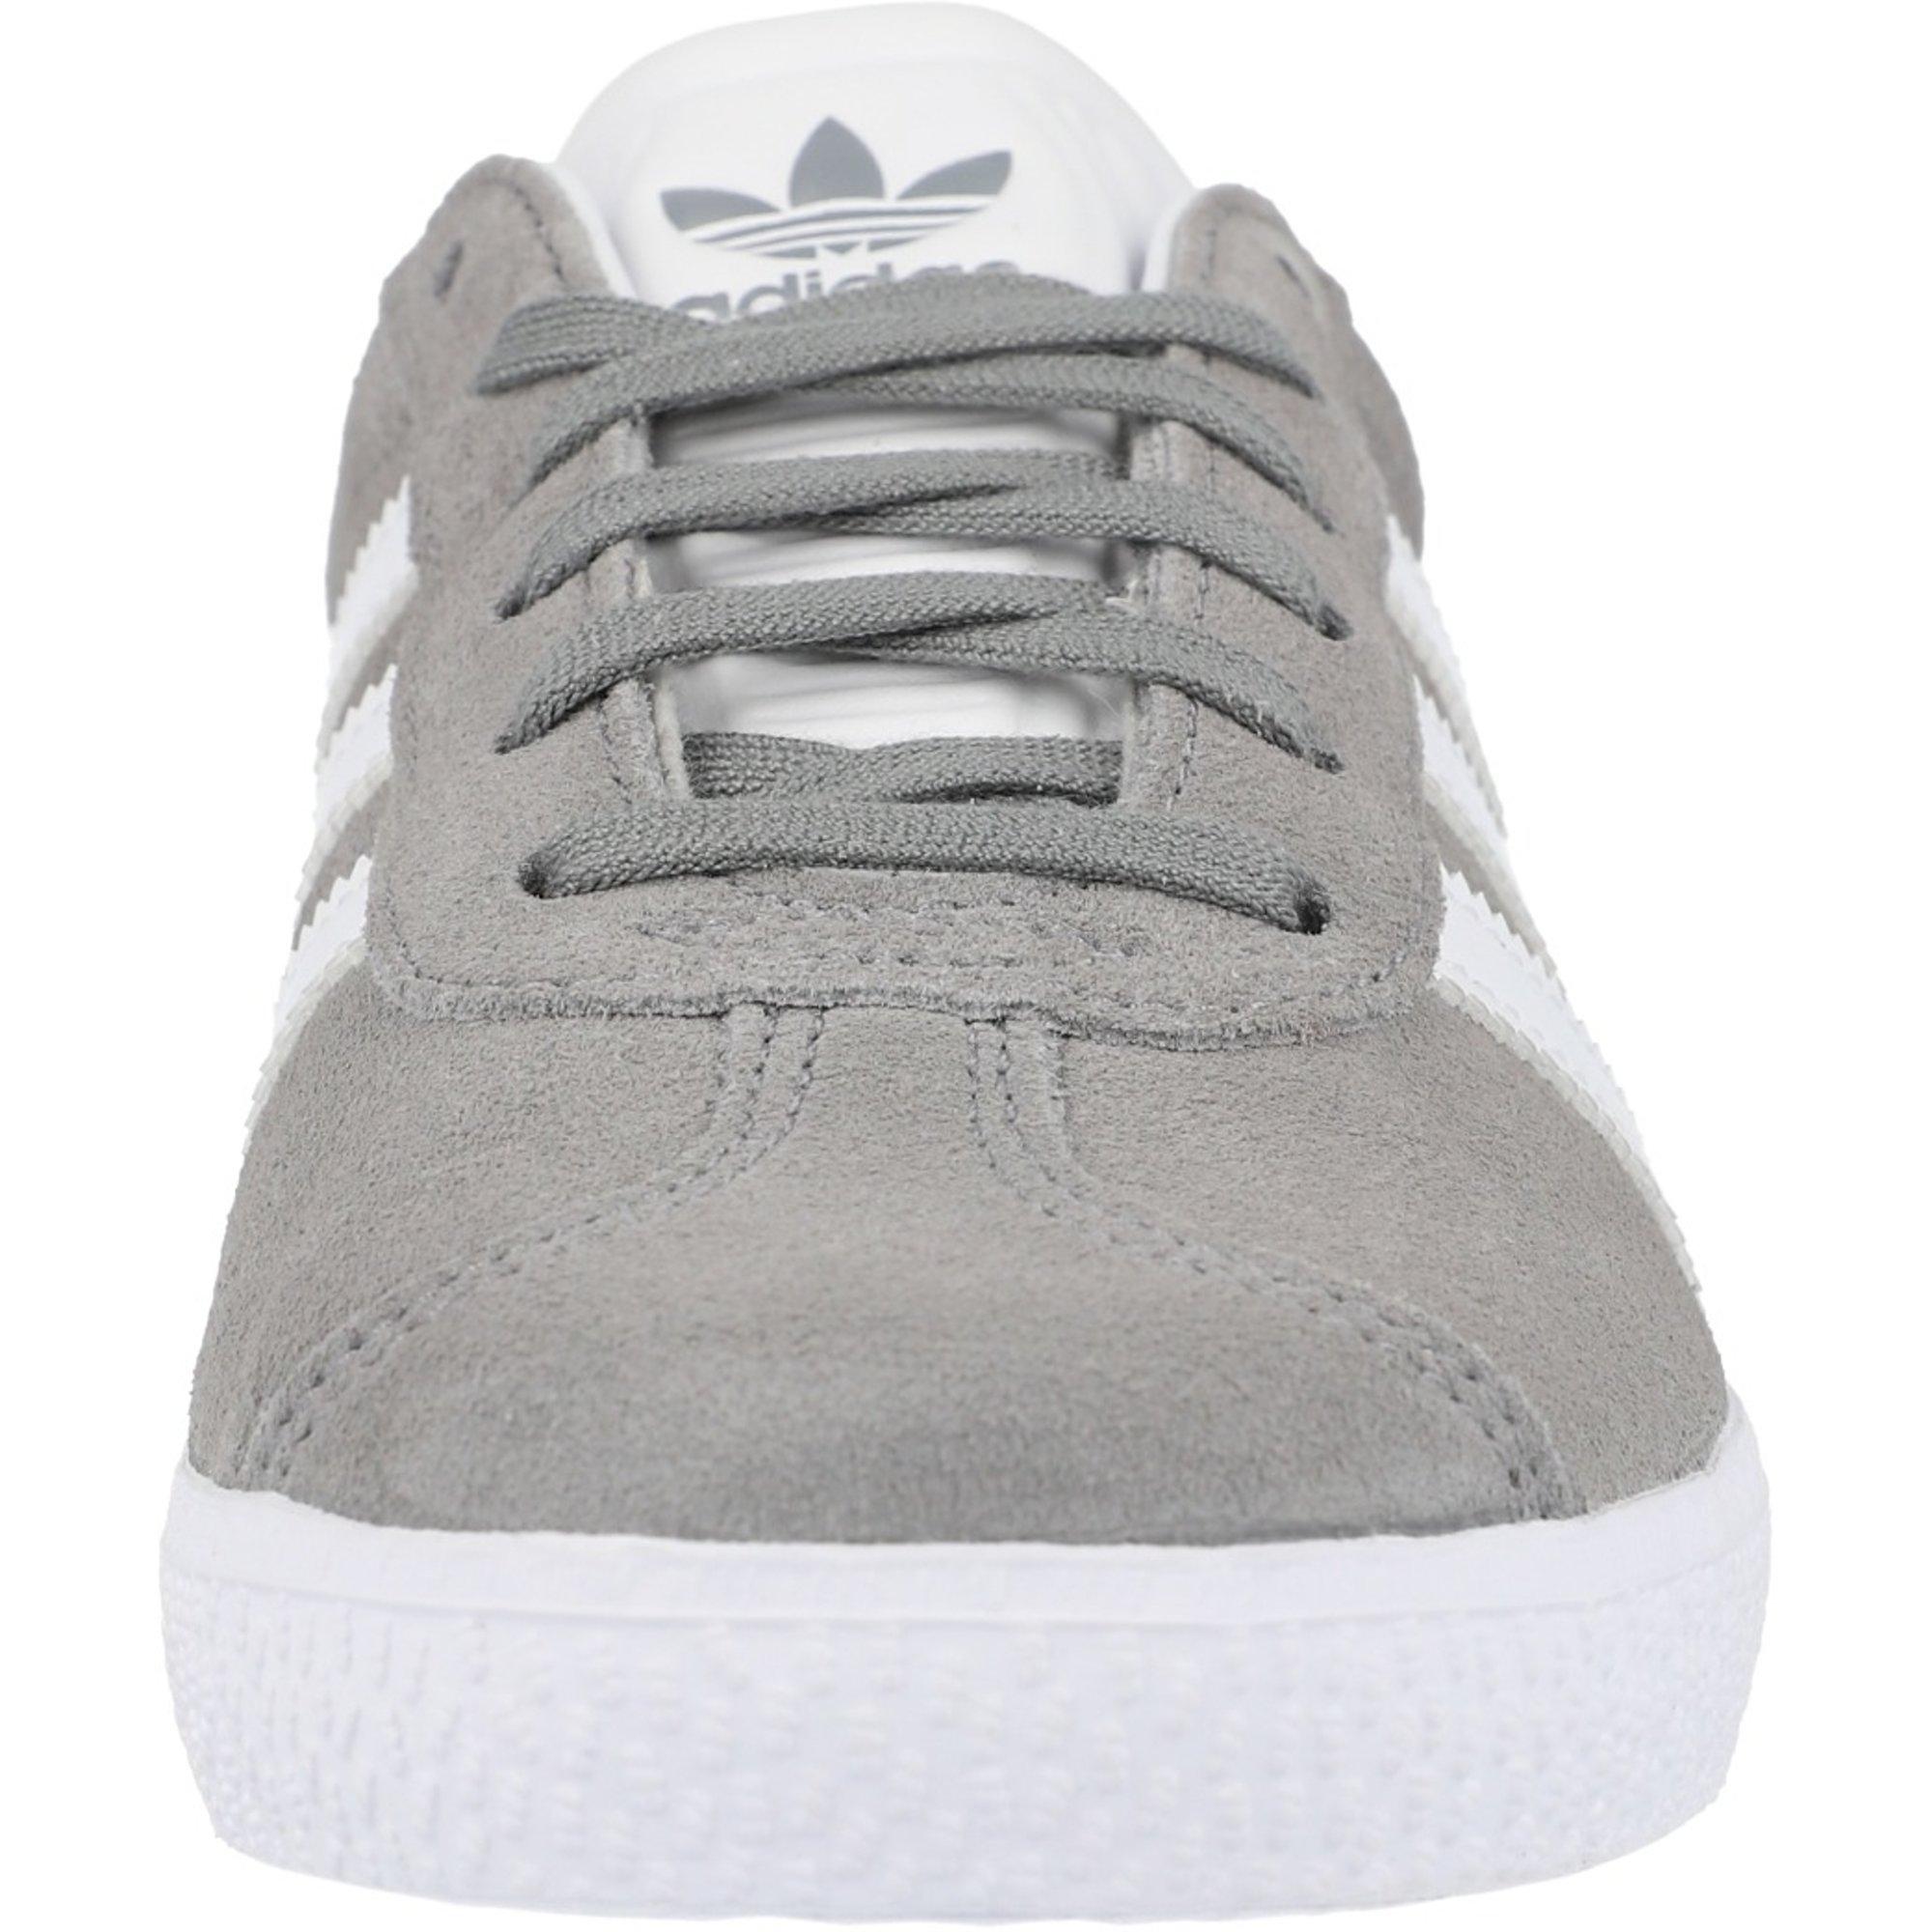 adidas Originals Gazelle J Grey/Gold Leather